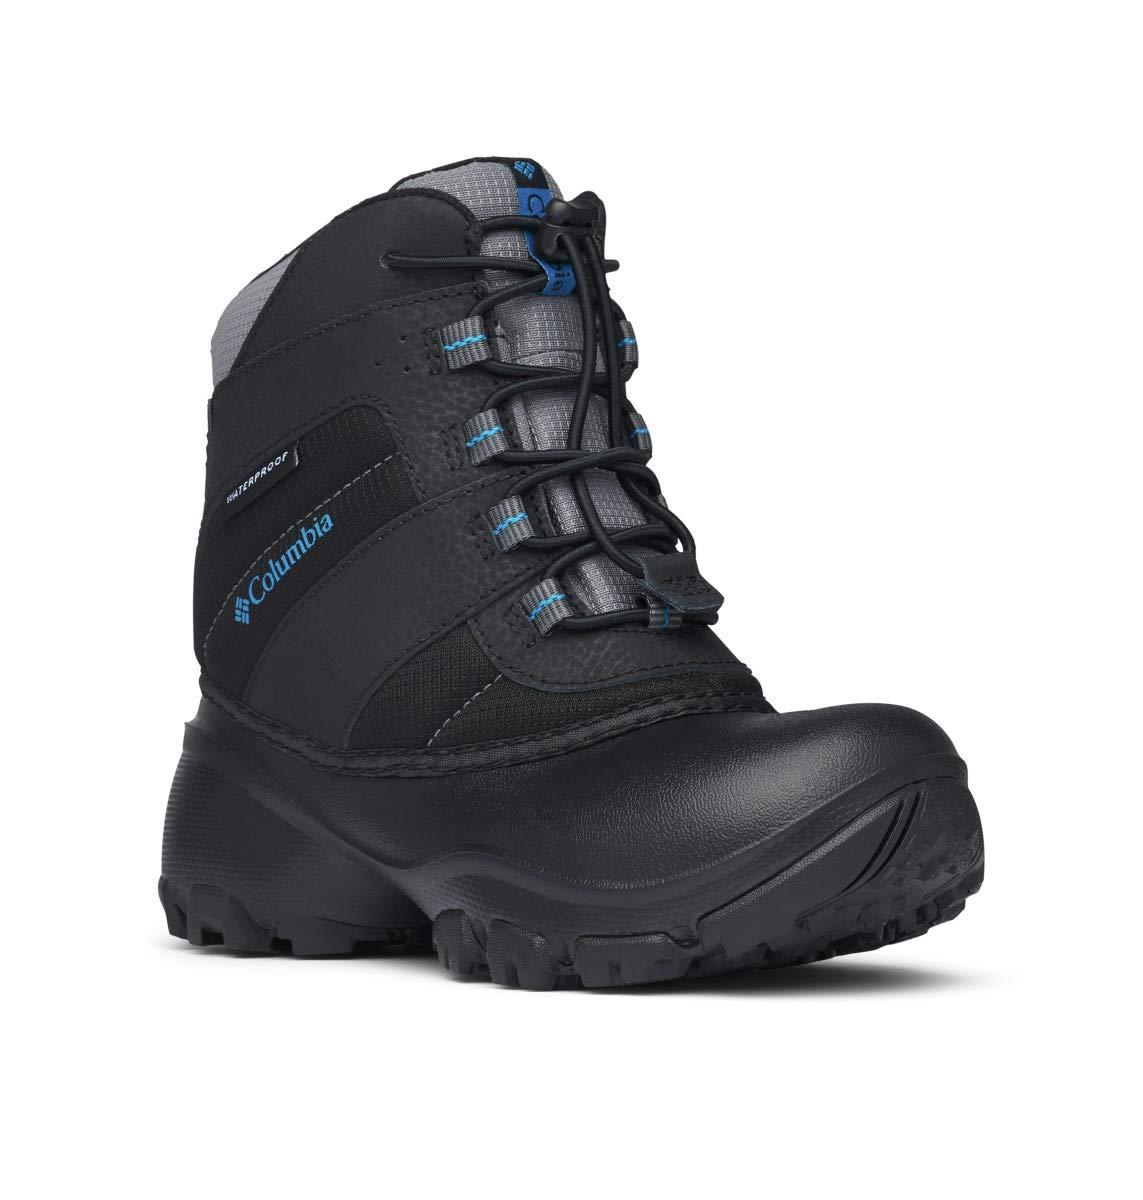 Columbia Youth Rope Tow I Waterproof Winter Boot (Little Kid/Big Kid), Black/Dark Compass, 3 M US Little Kid